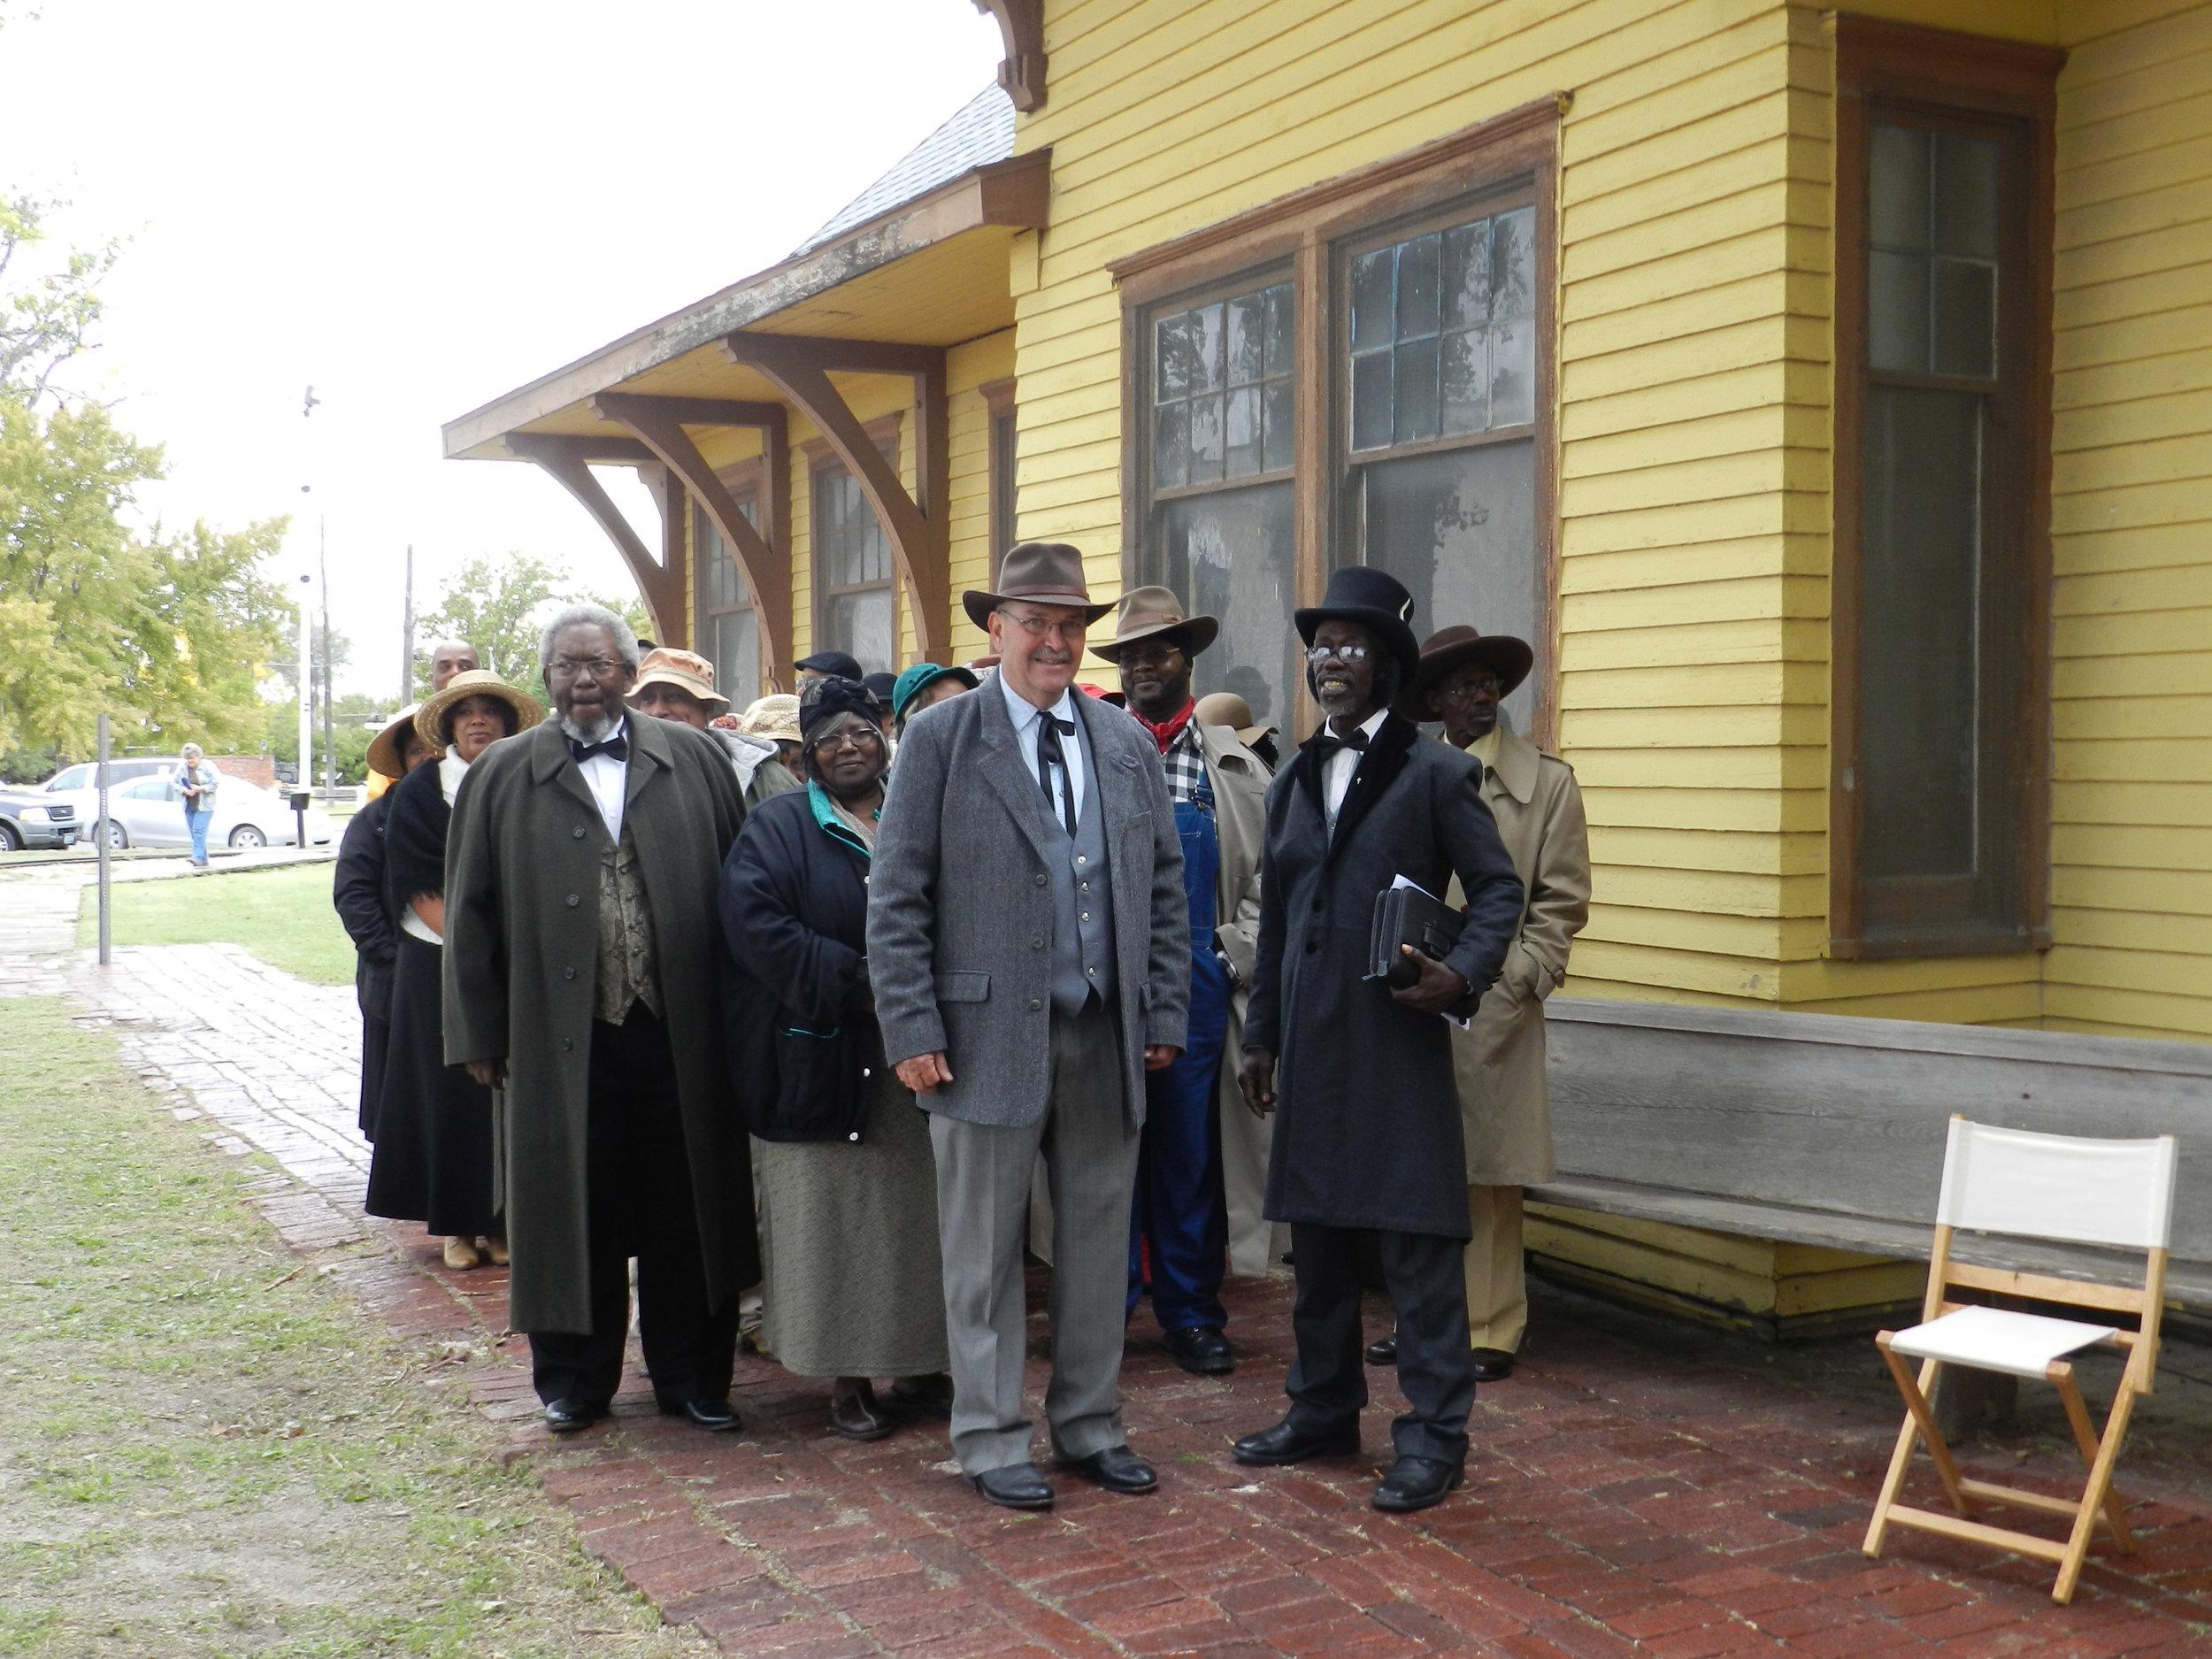 Settlers ariving at the Ellis depot.